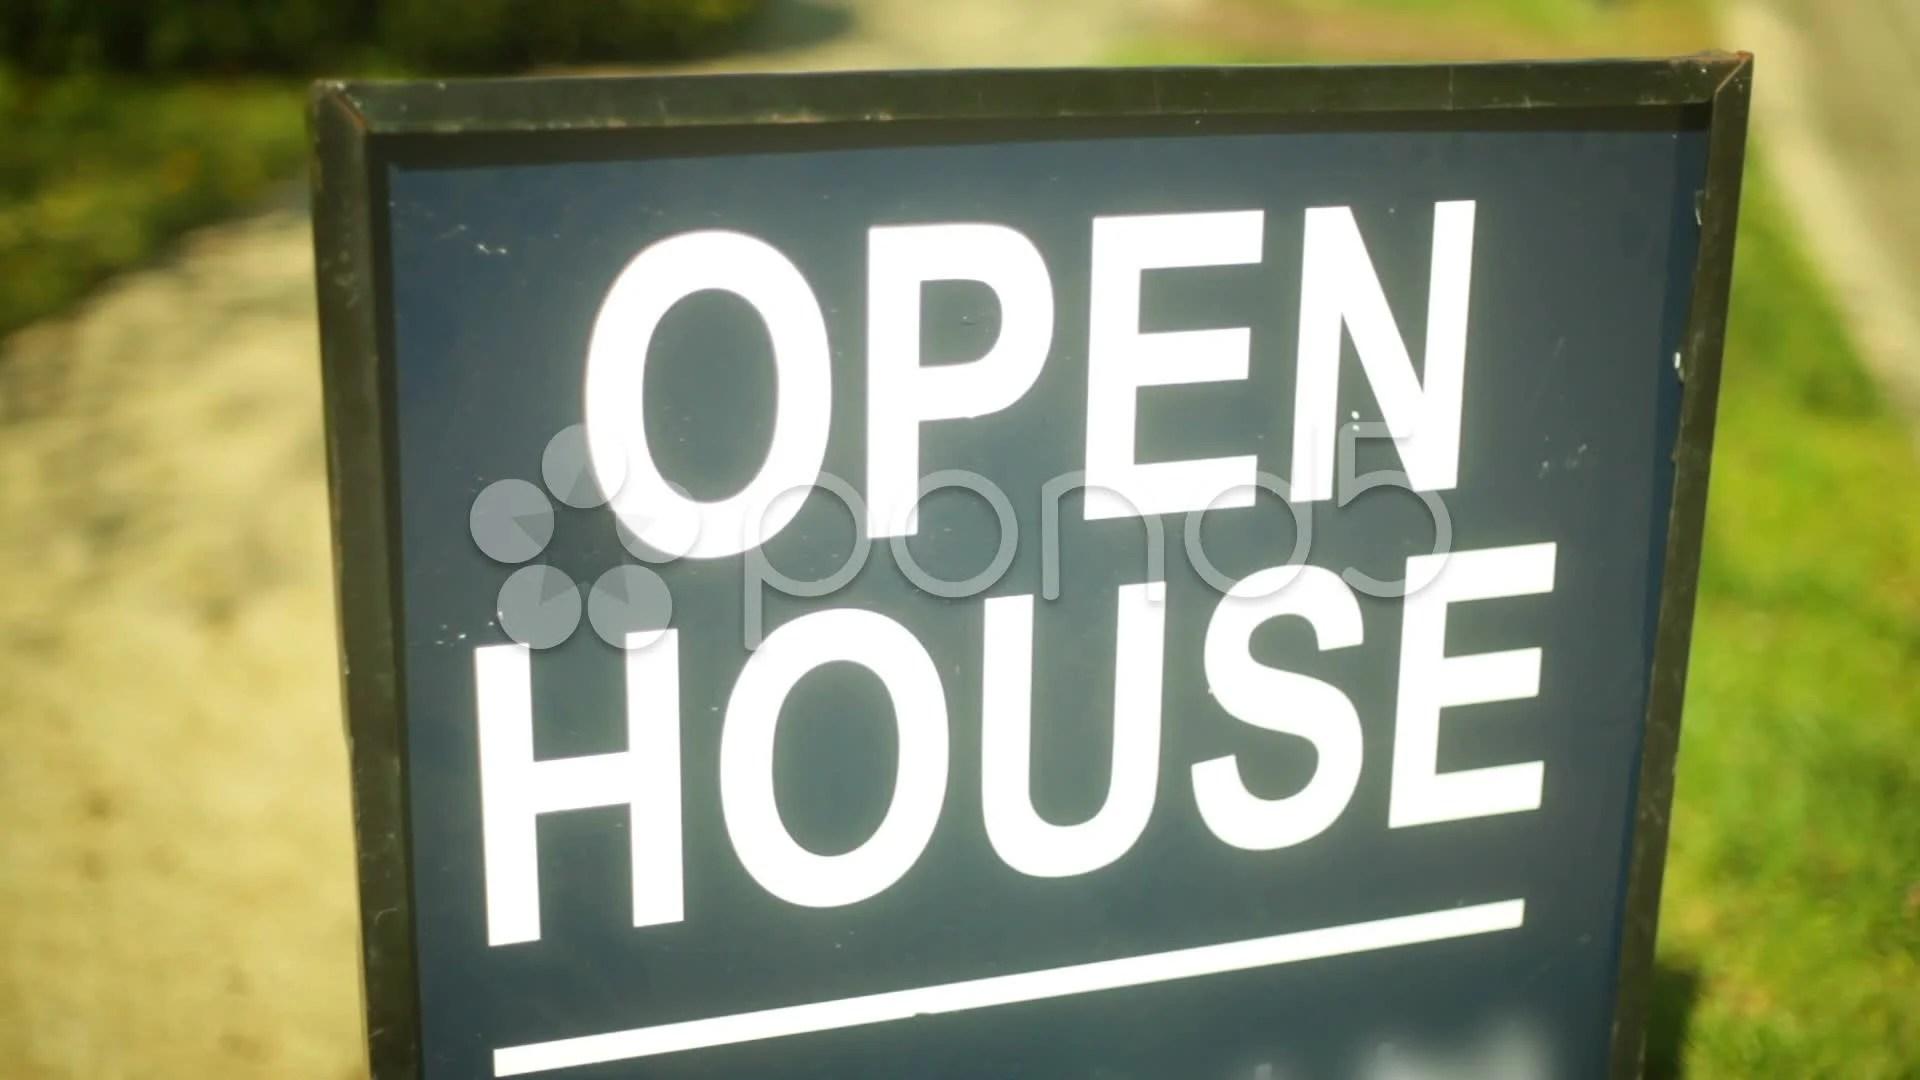 Congenial Open House Sign Real E Footage 022760549 Prevstill Open House Signs Sheet School Realtors Open House Sign curbed Open House Sign